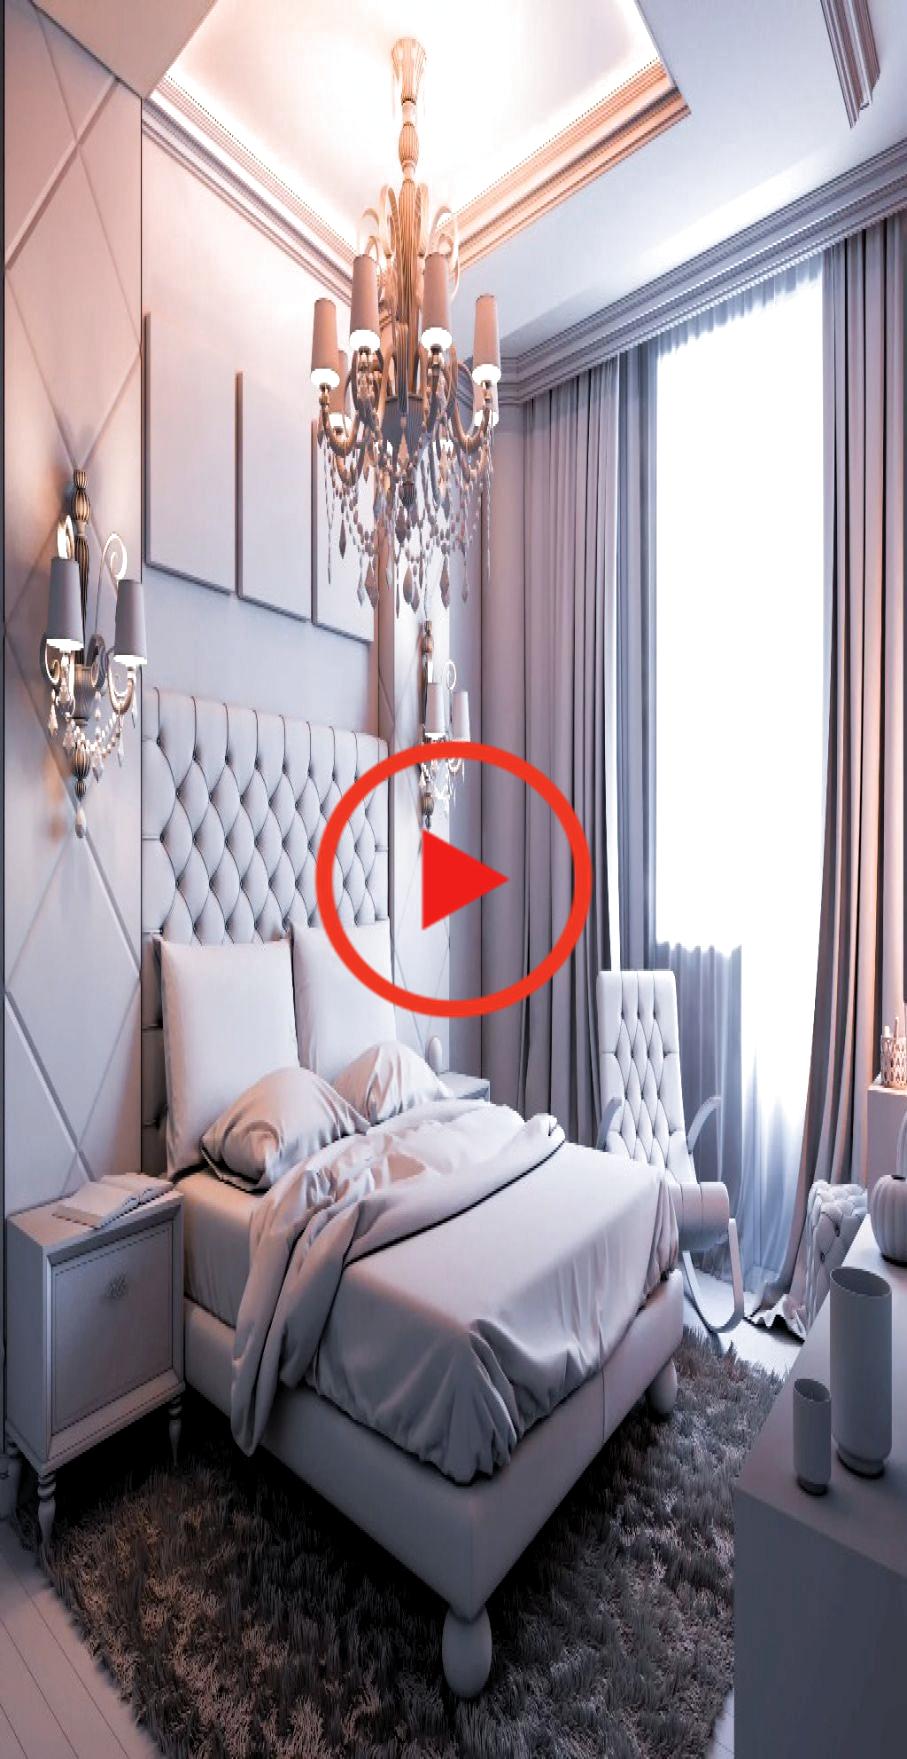 48 Best Of Small Bedroom Ideas Couple ideen Dachschräge grau 48 B – 48 Best Of Small Bedroom Ideas